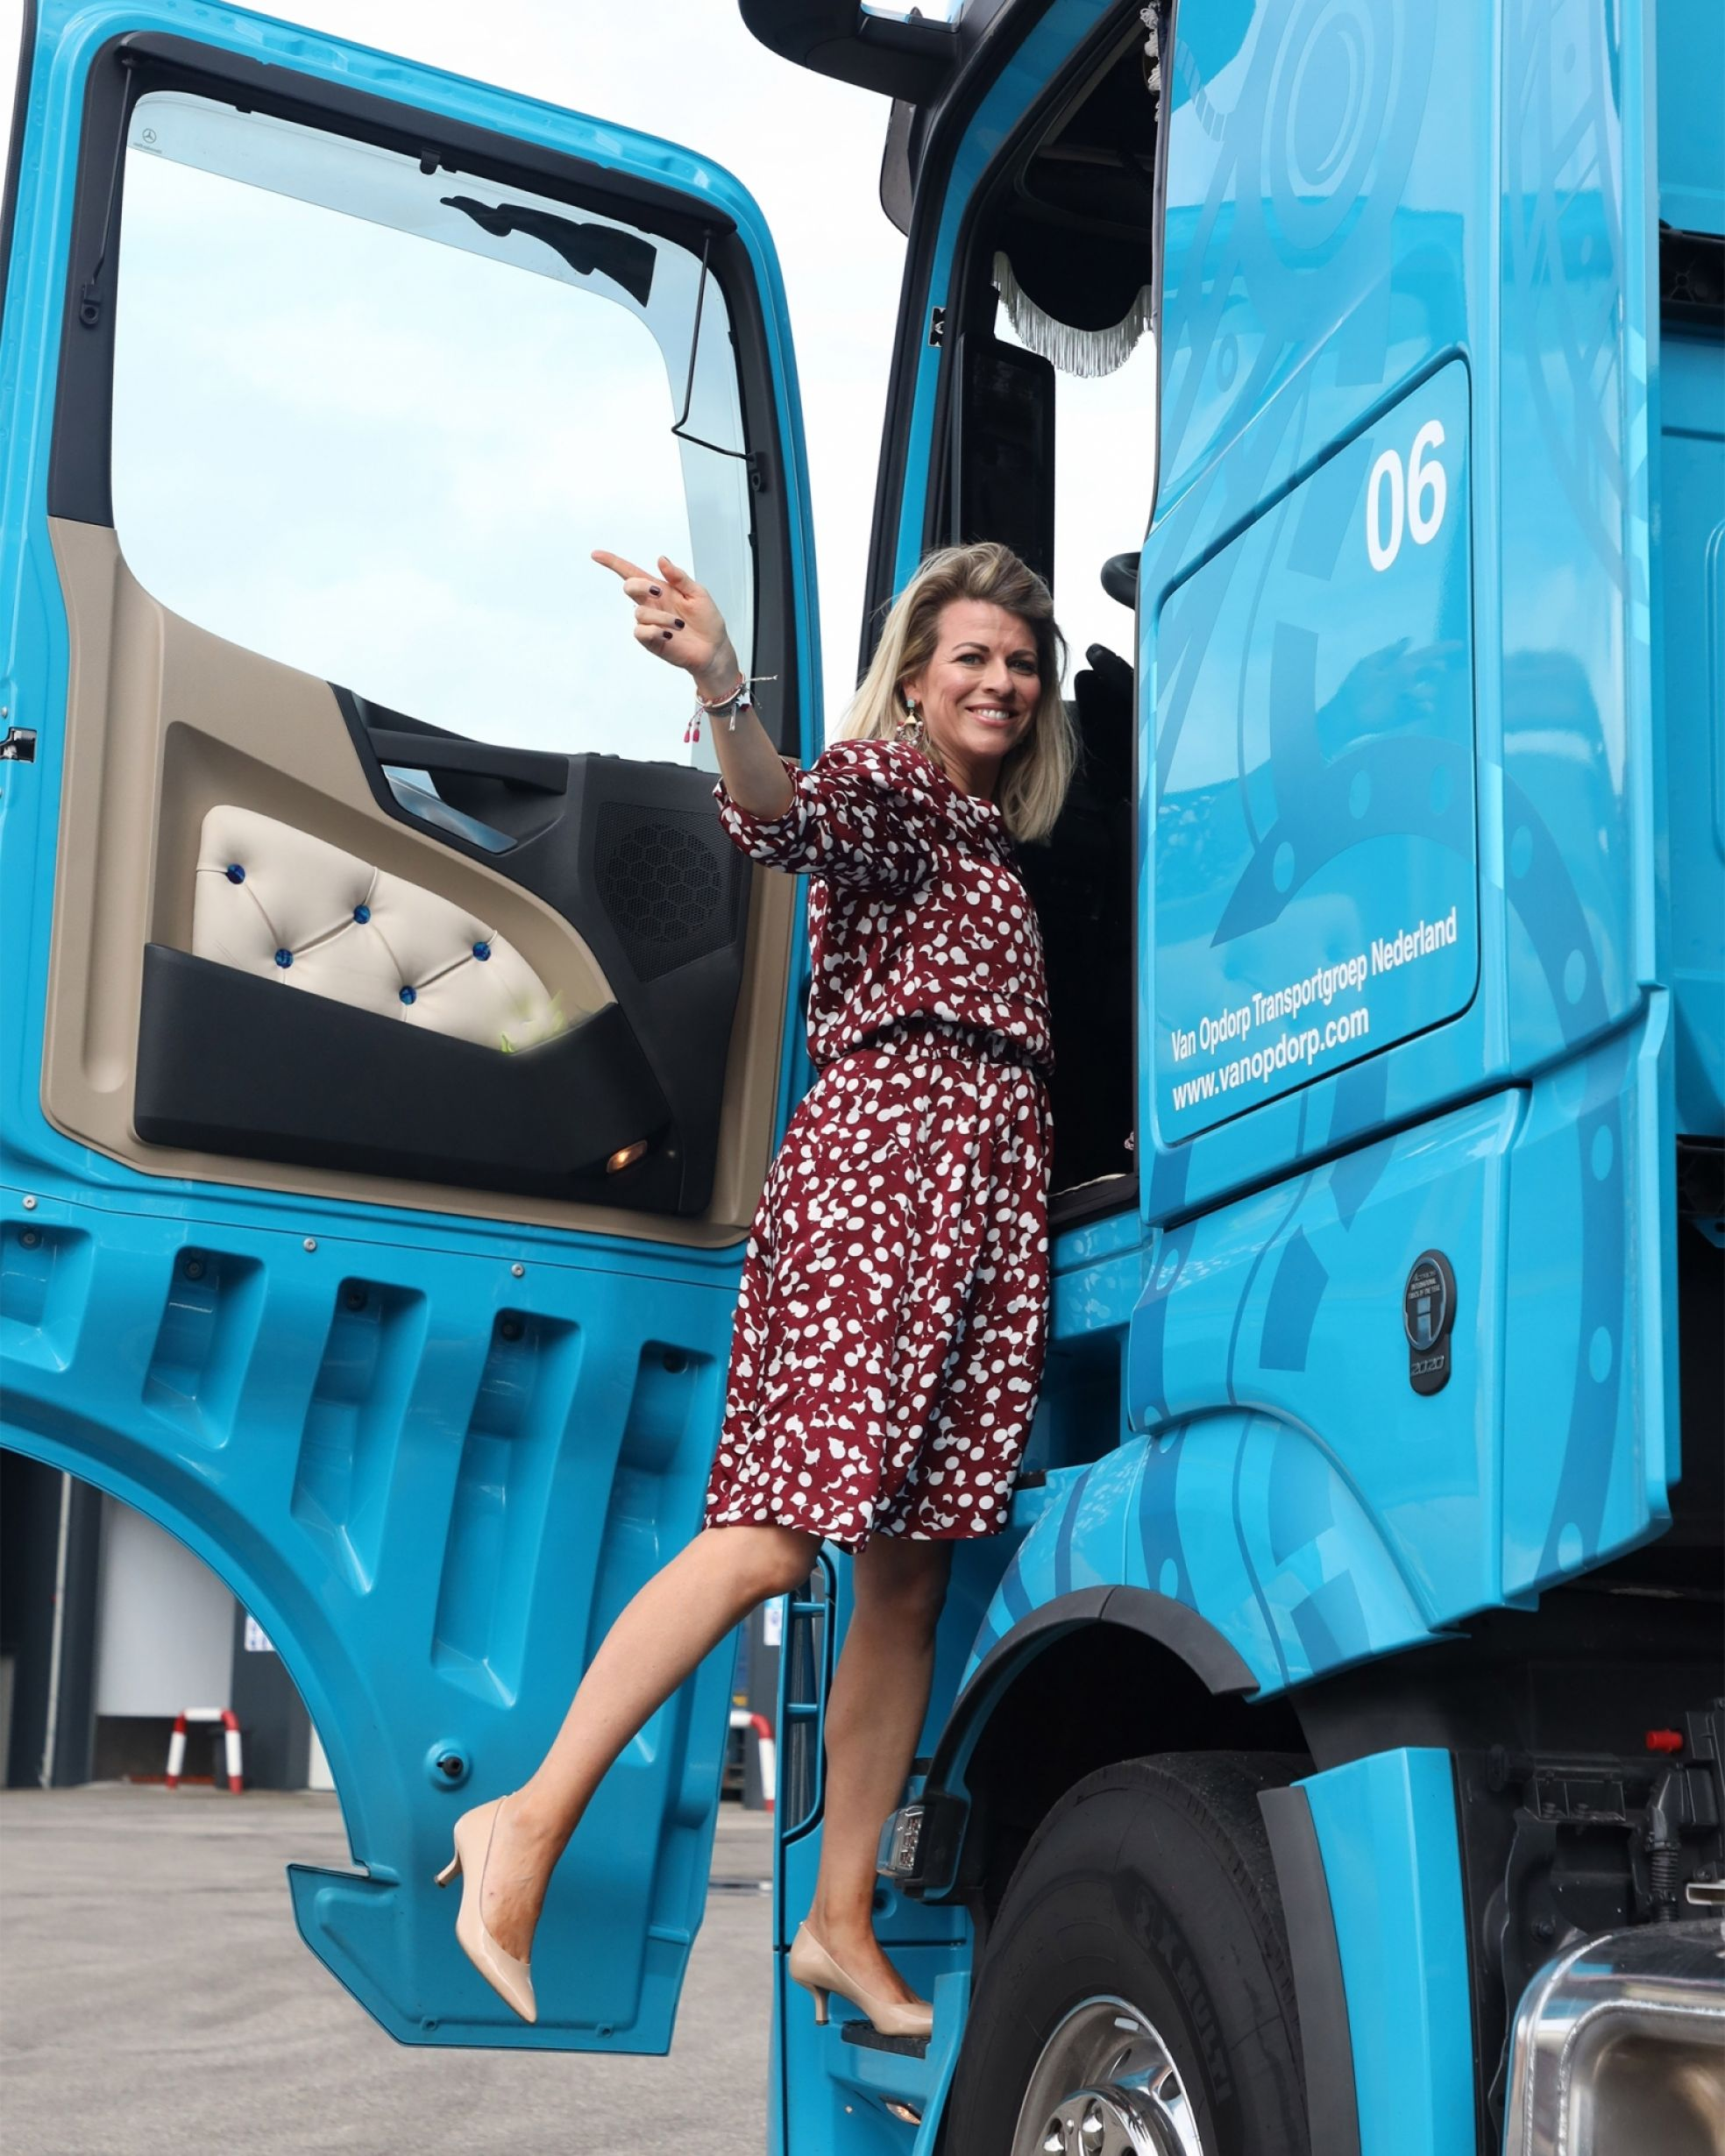 Manon truck transport staand